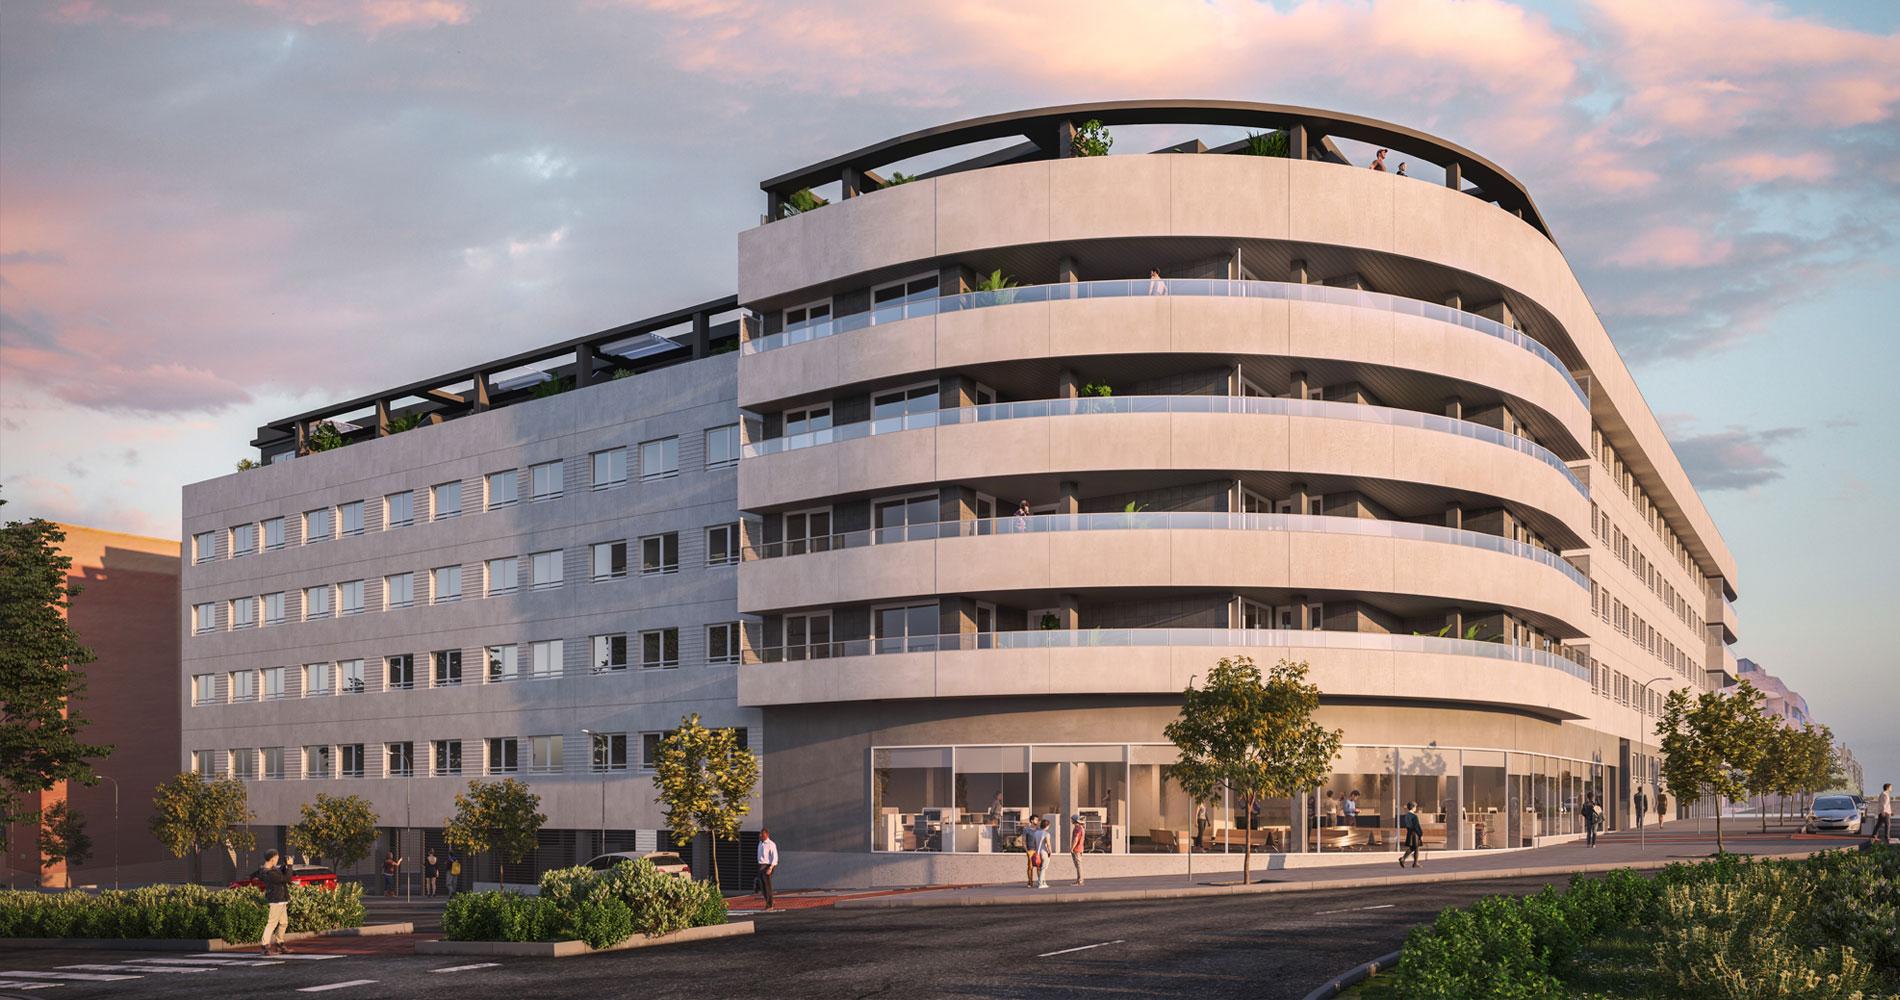 Residencial Passivhaus en Valdemoro / Grupo LOBE